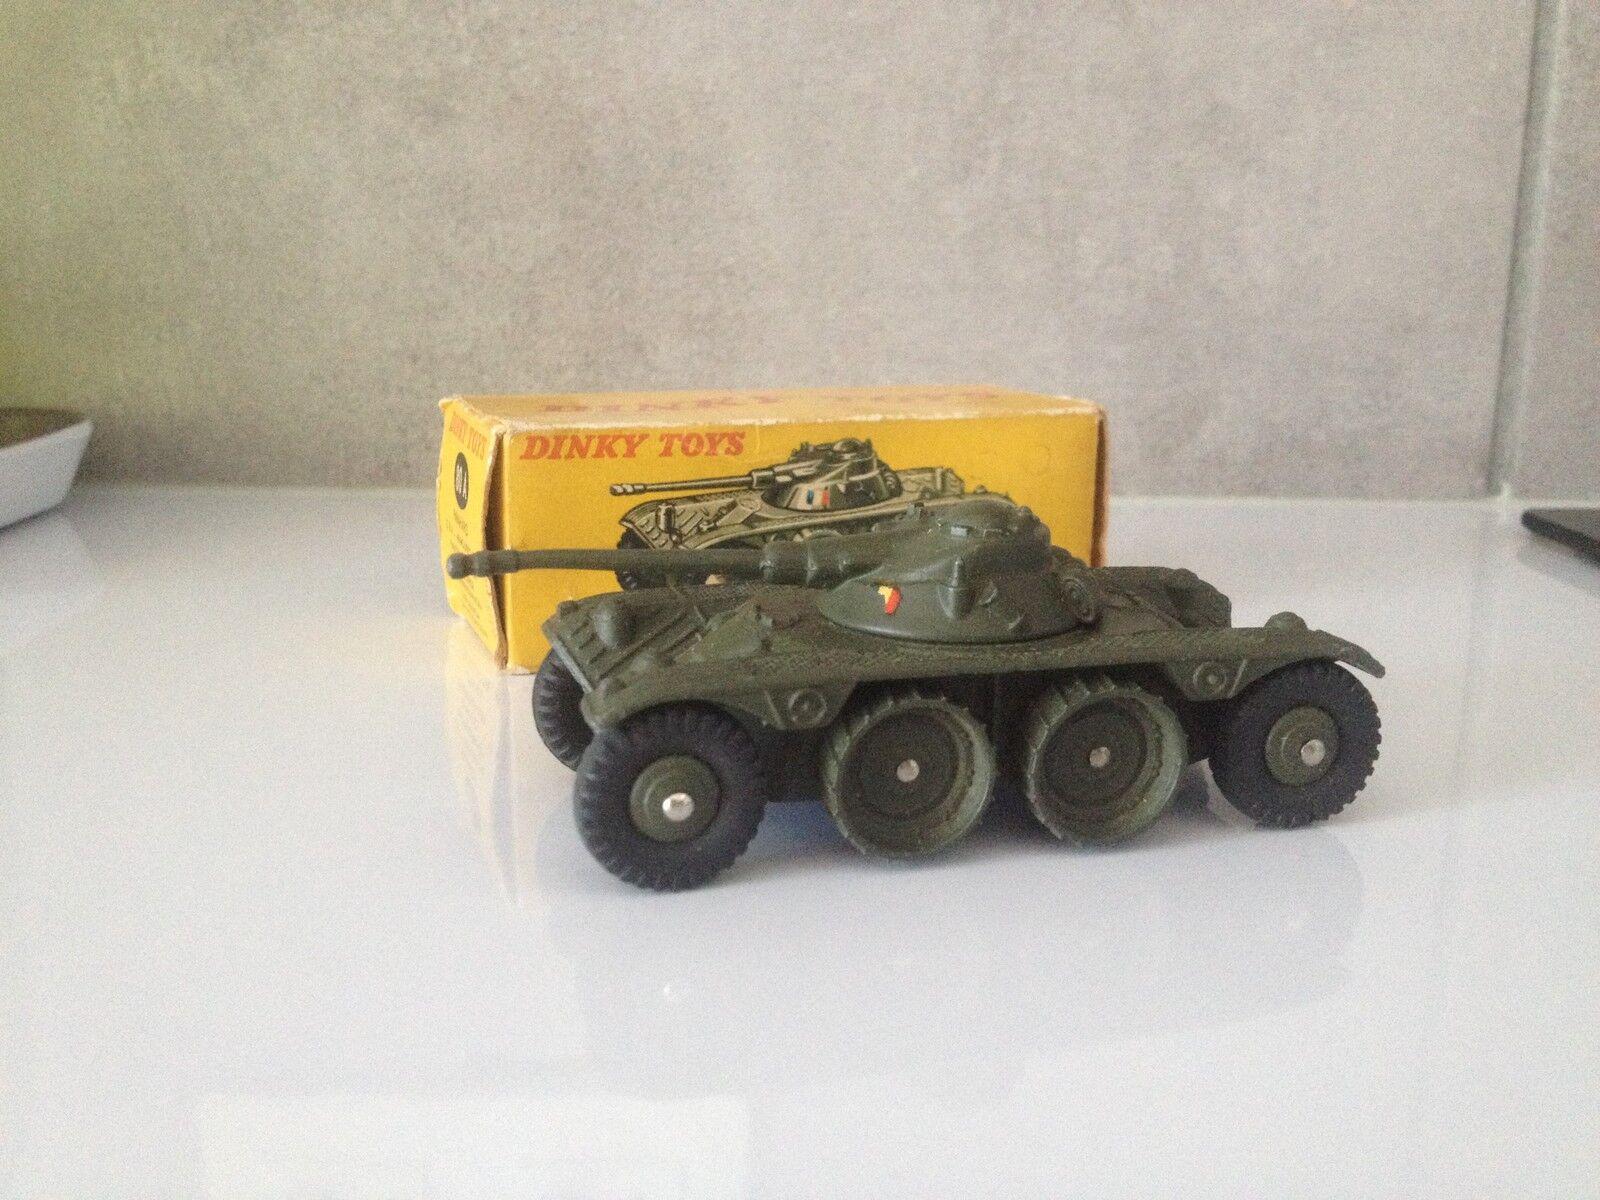 Dinky toys 80a panhard ebr char militaire d origine avec boite